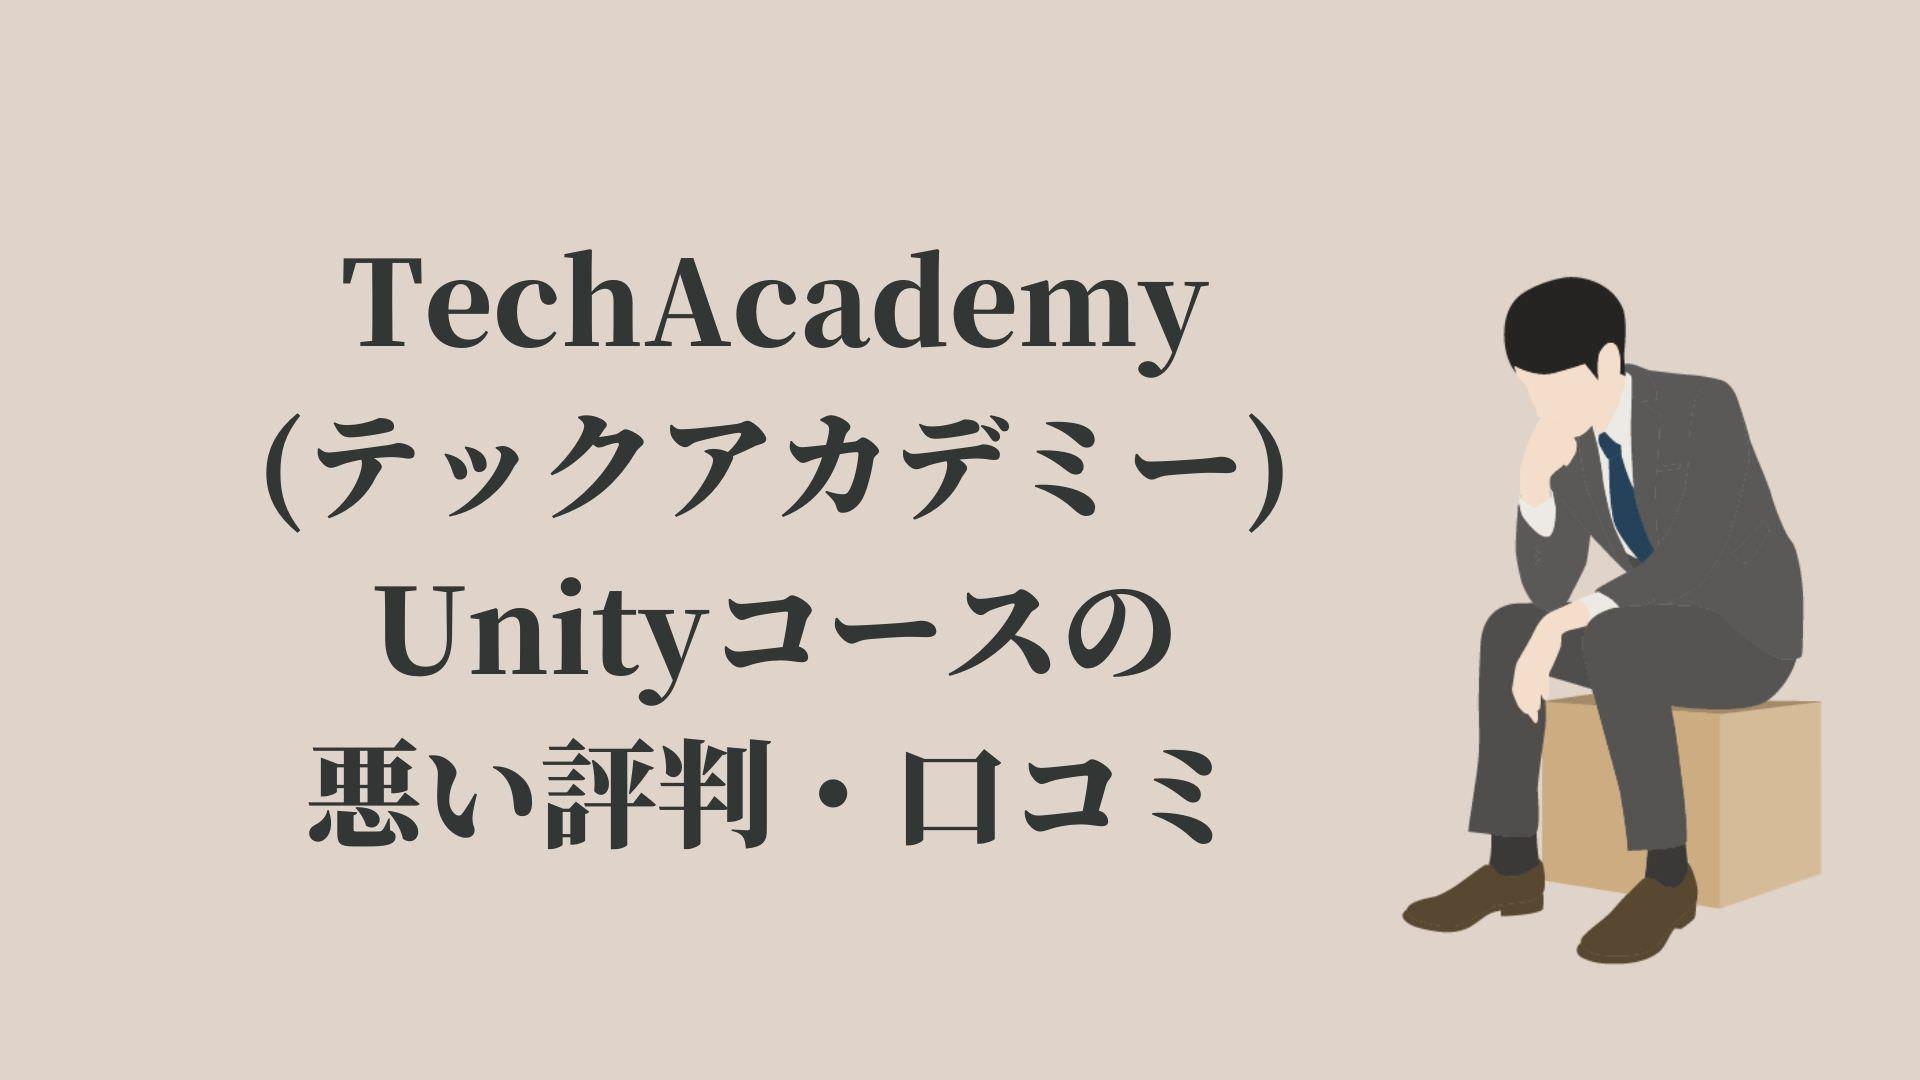 TechAcademy(テックアカデミー)Unityコースの悪い評判・口コミ